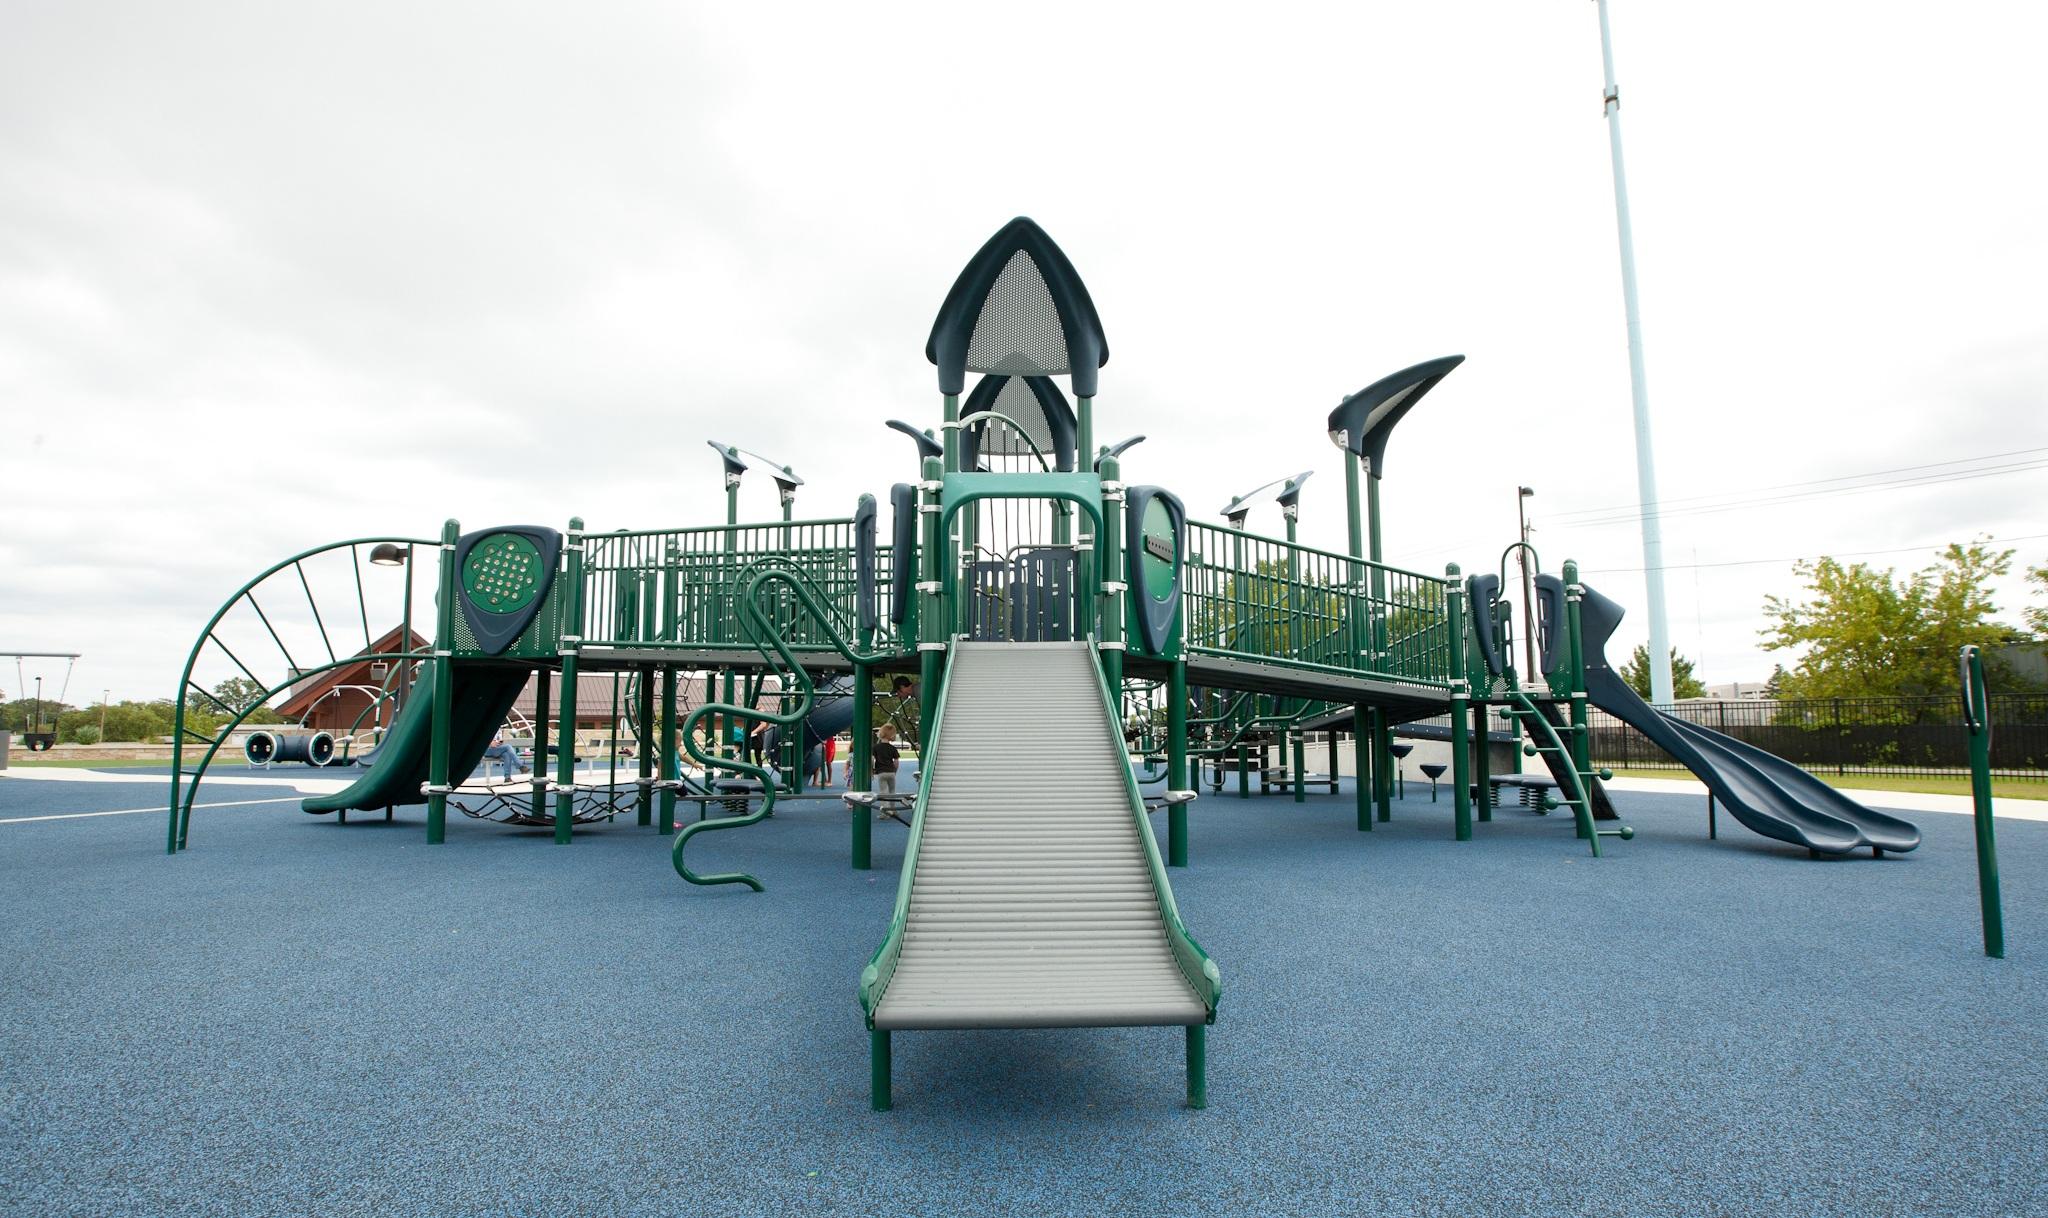 Richard E. Maslowski Park - Glendale